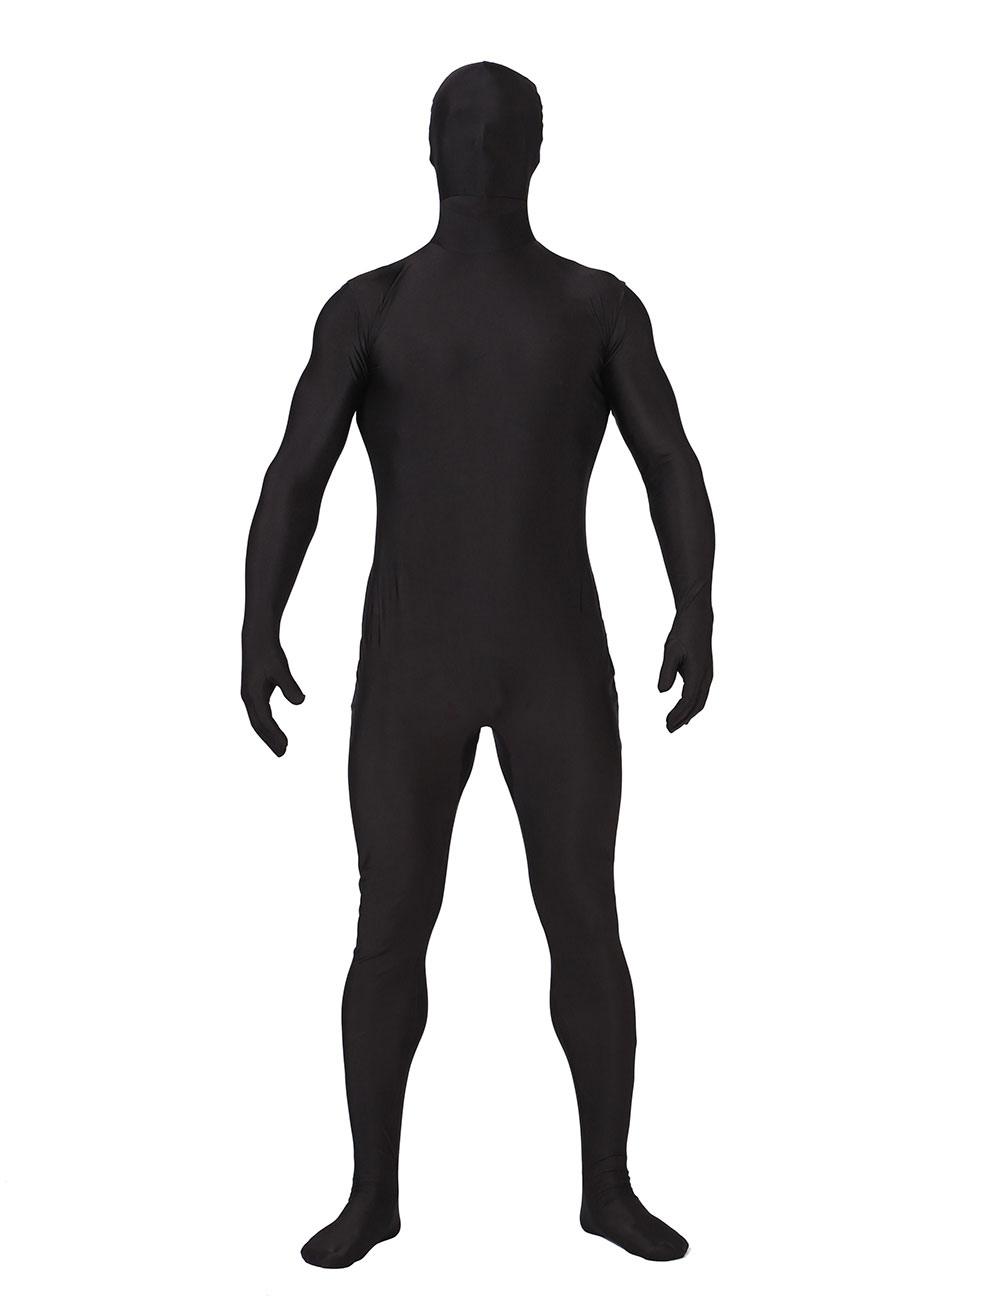 Halloween Black Spandex Zentai Suit Full Bodysuit Costume